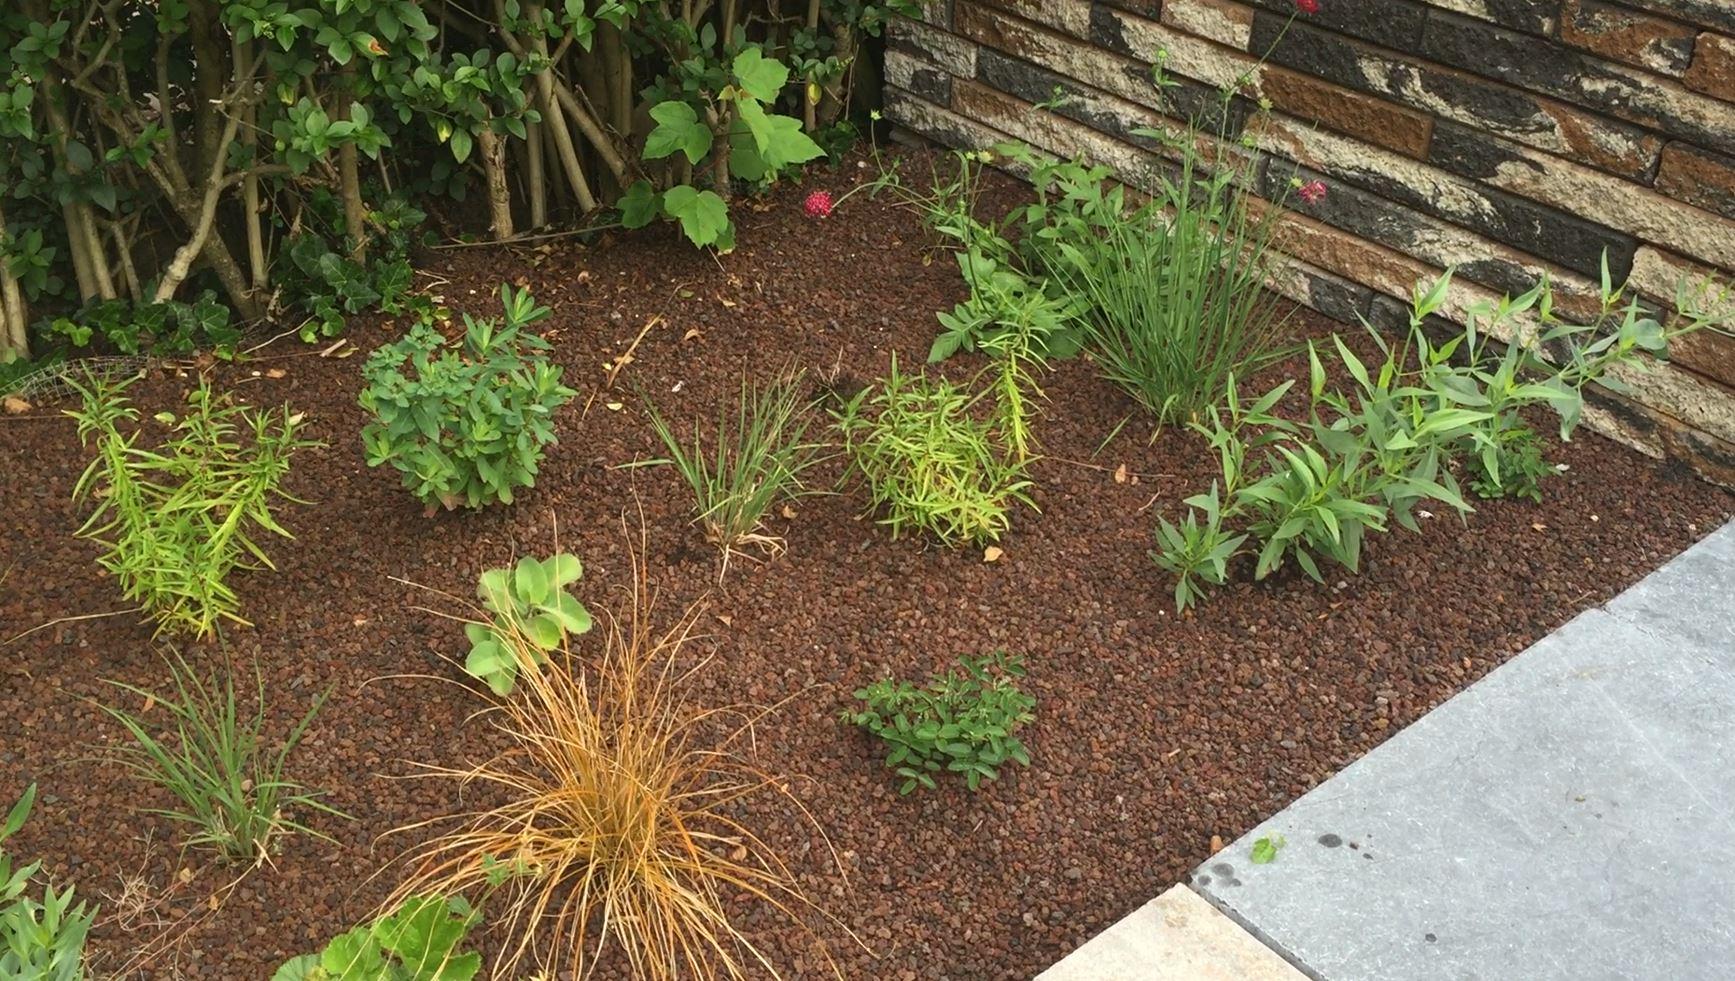 prairie tuin, onderhoudsvriendelijke tuin, hovenier vlaardingen